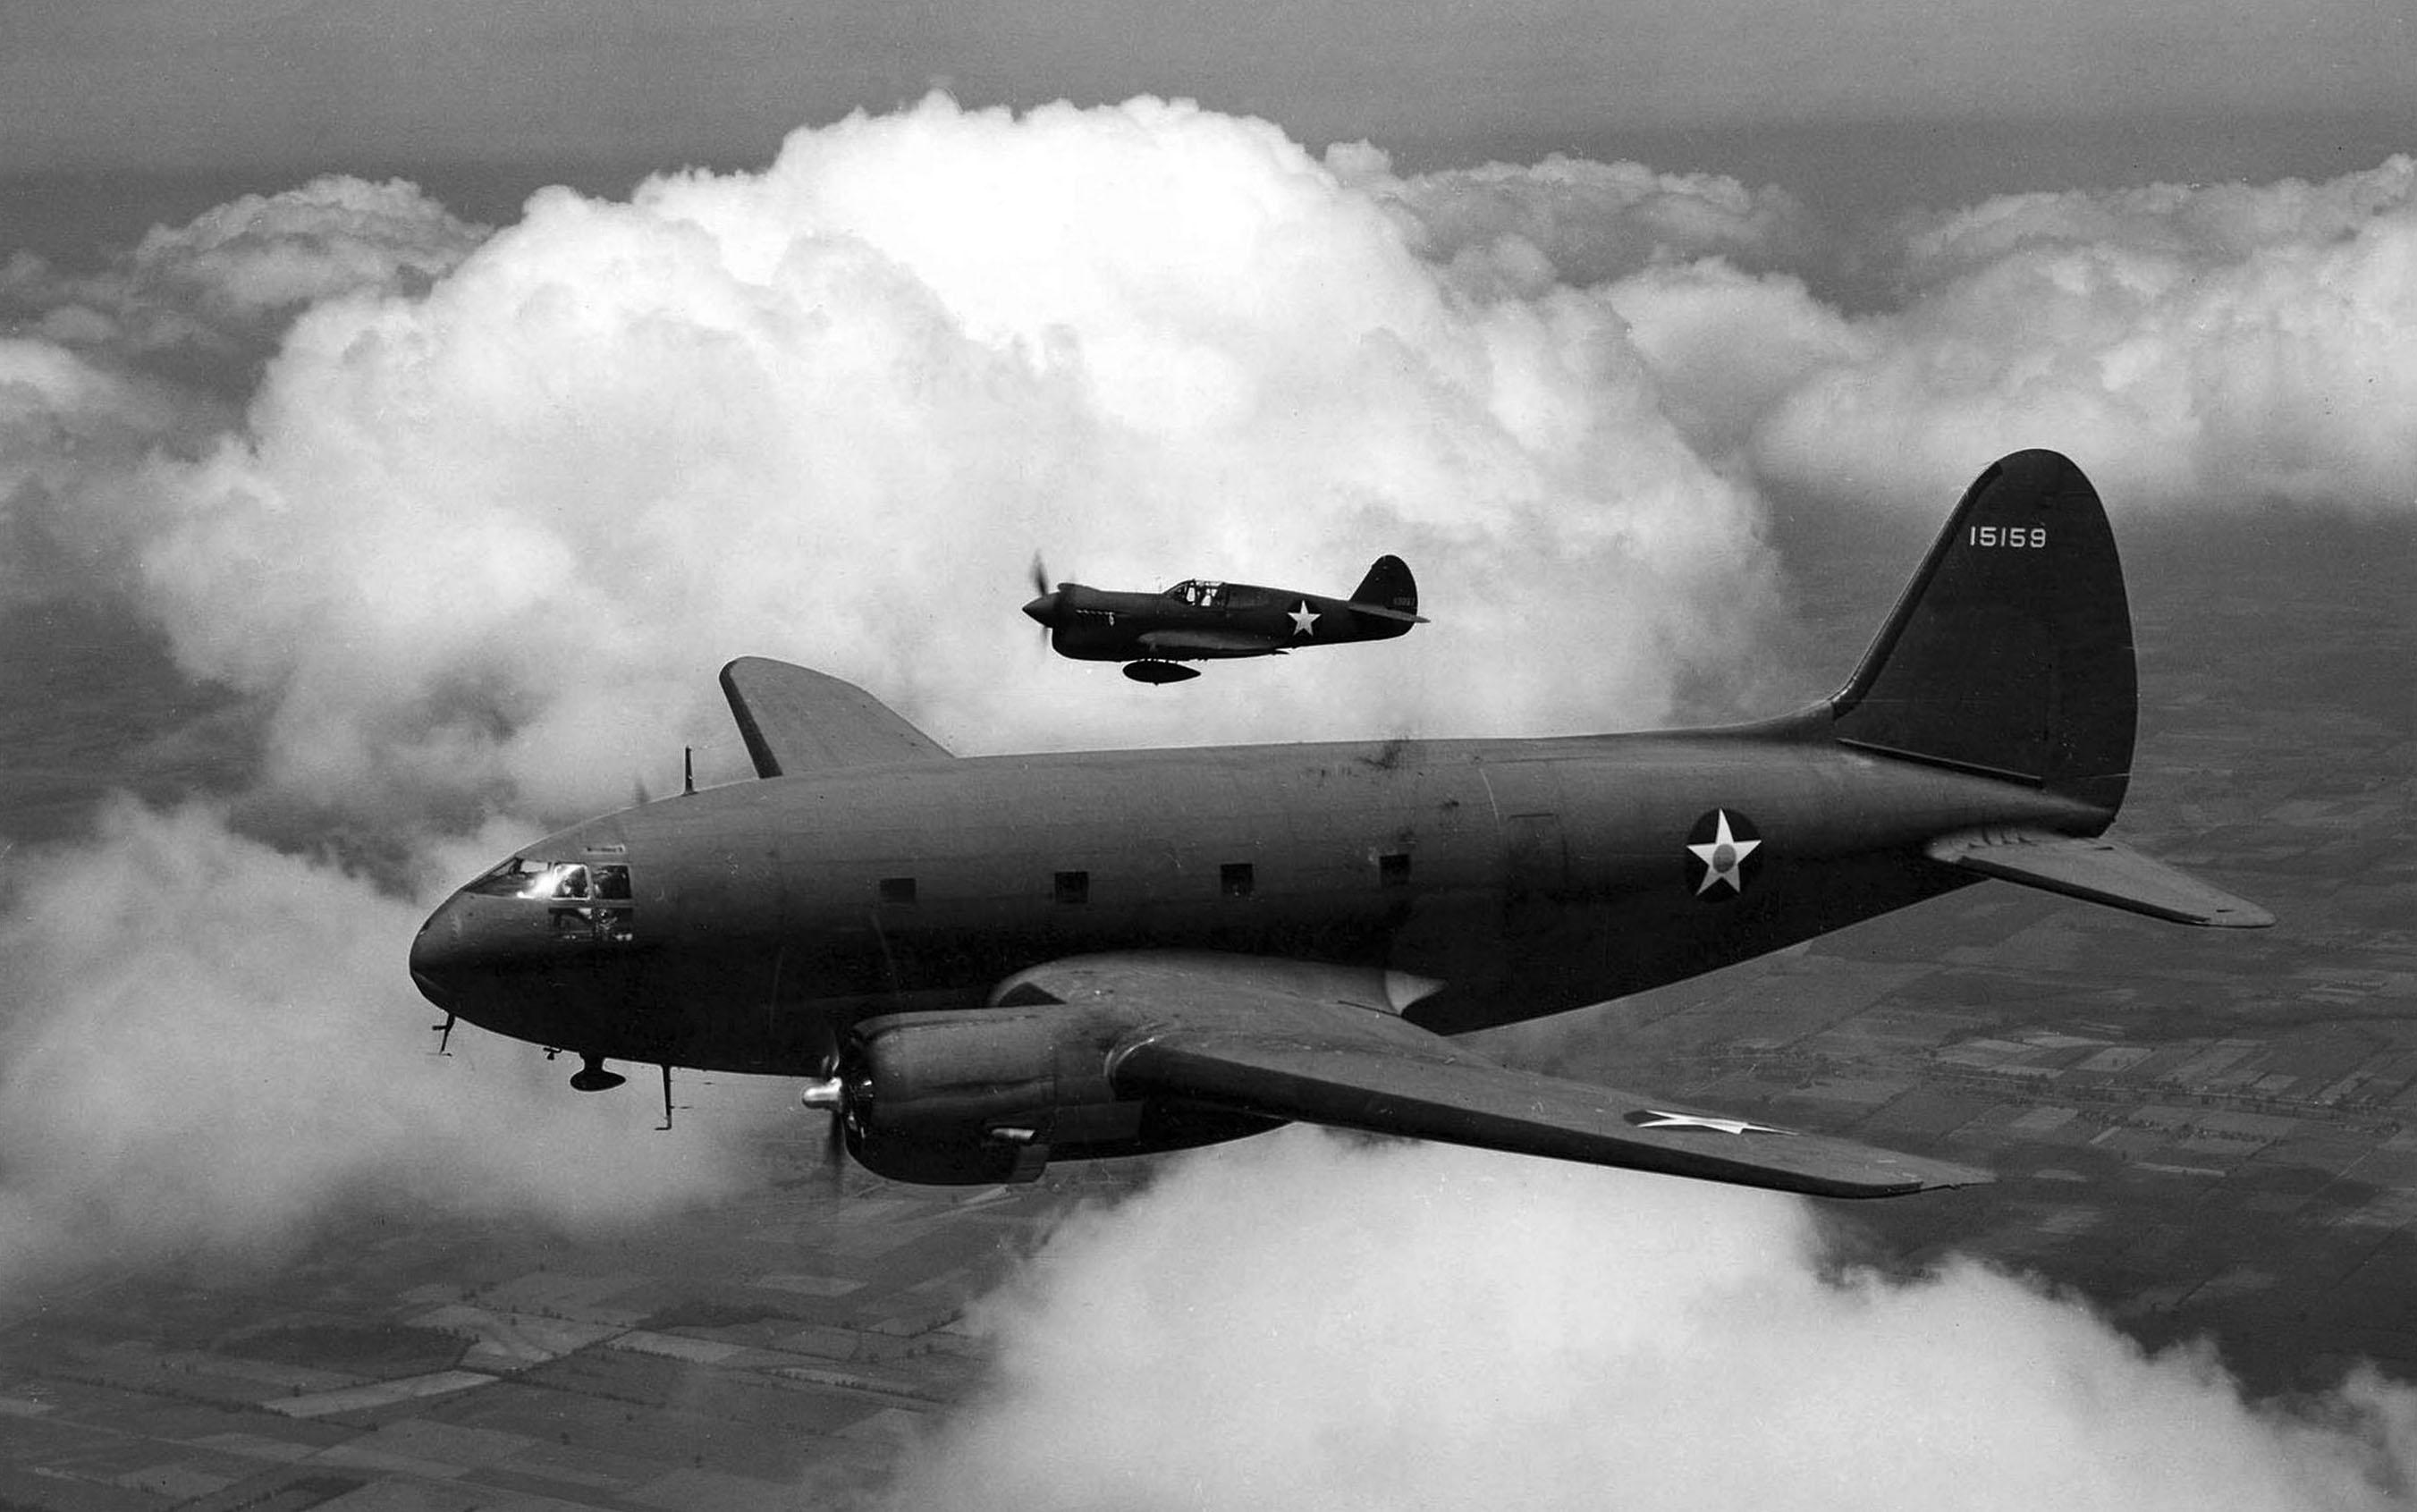 Classics: The Curtiss C-46 Commando